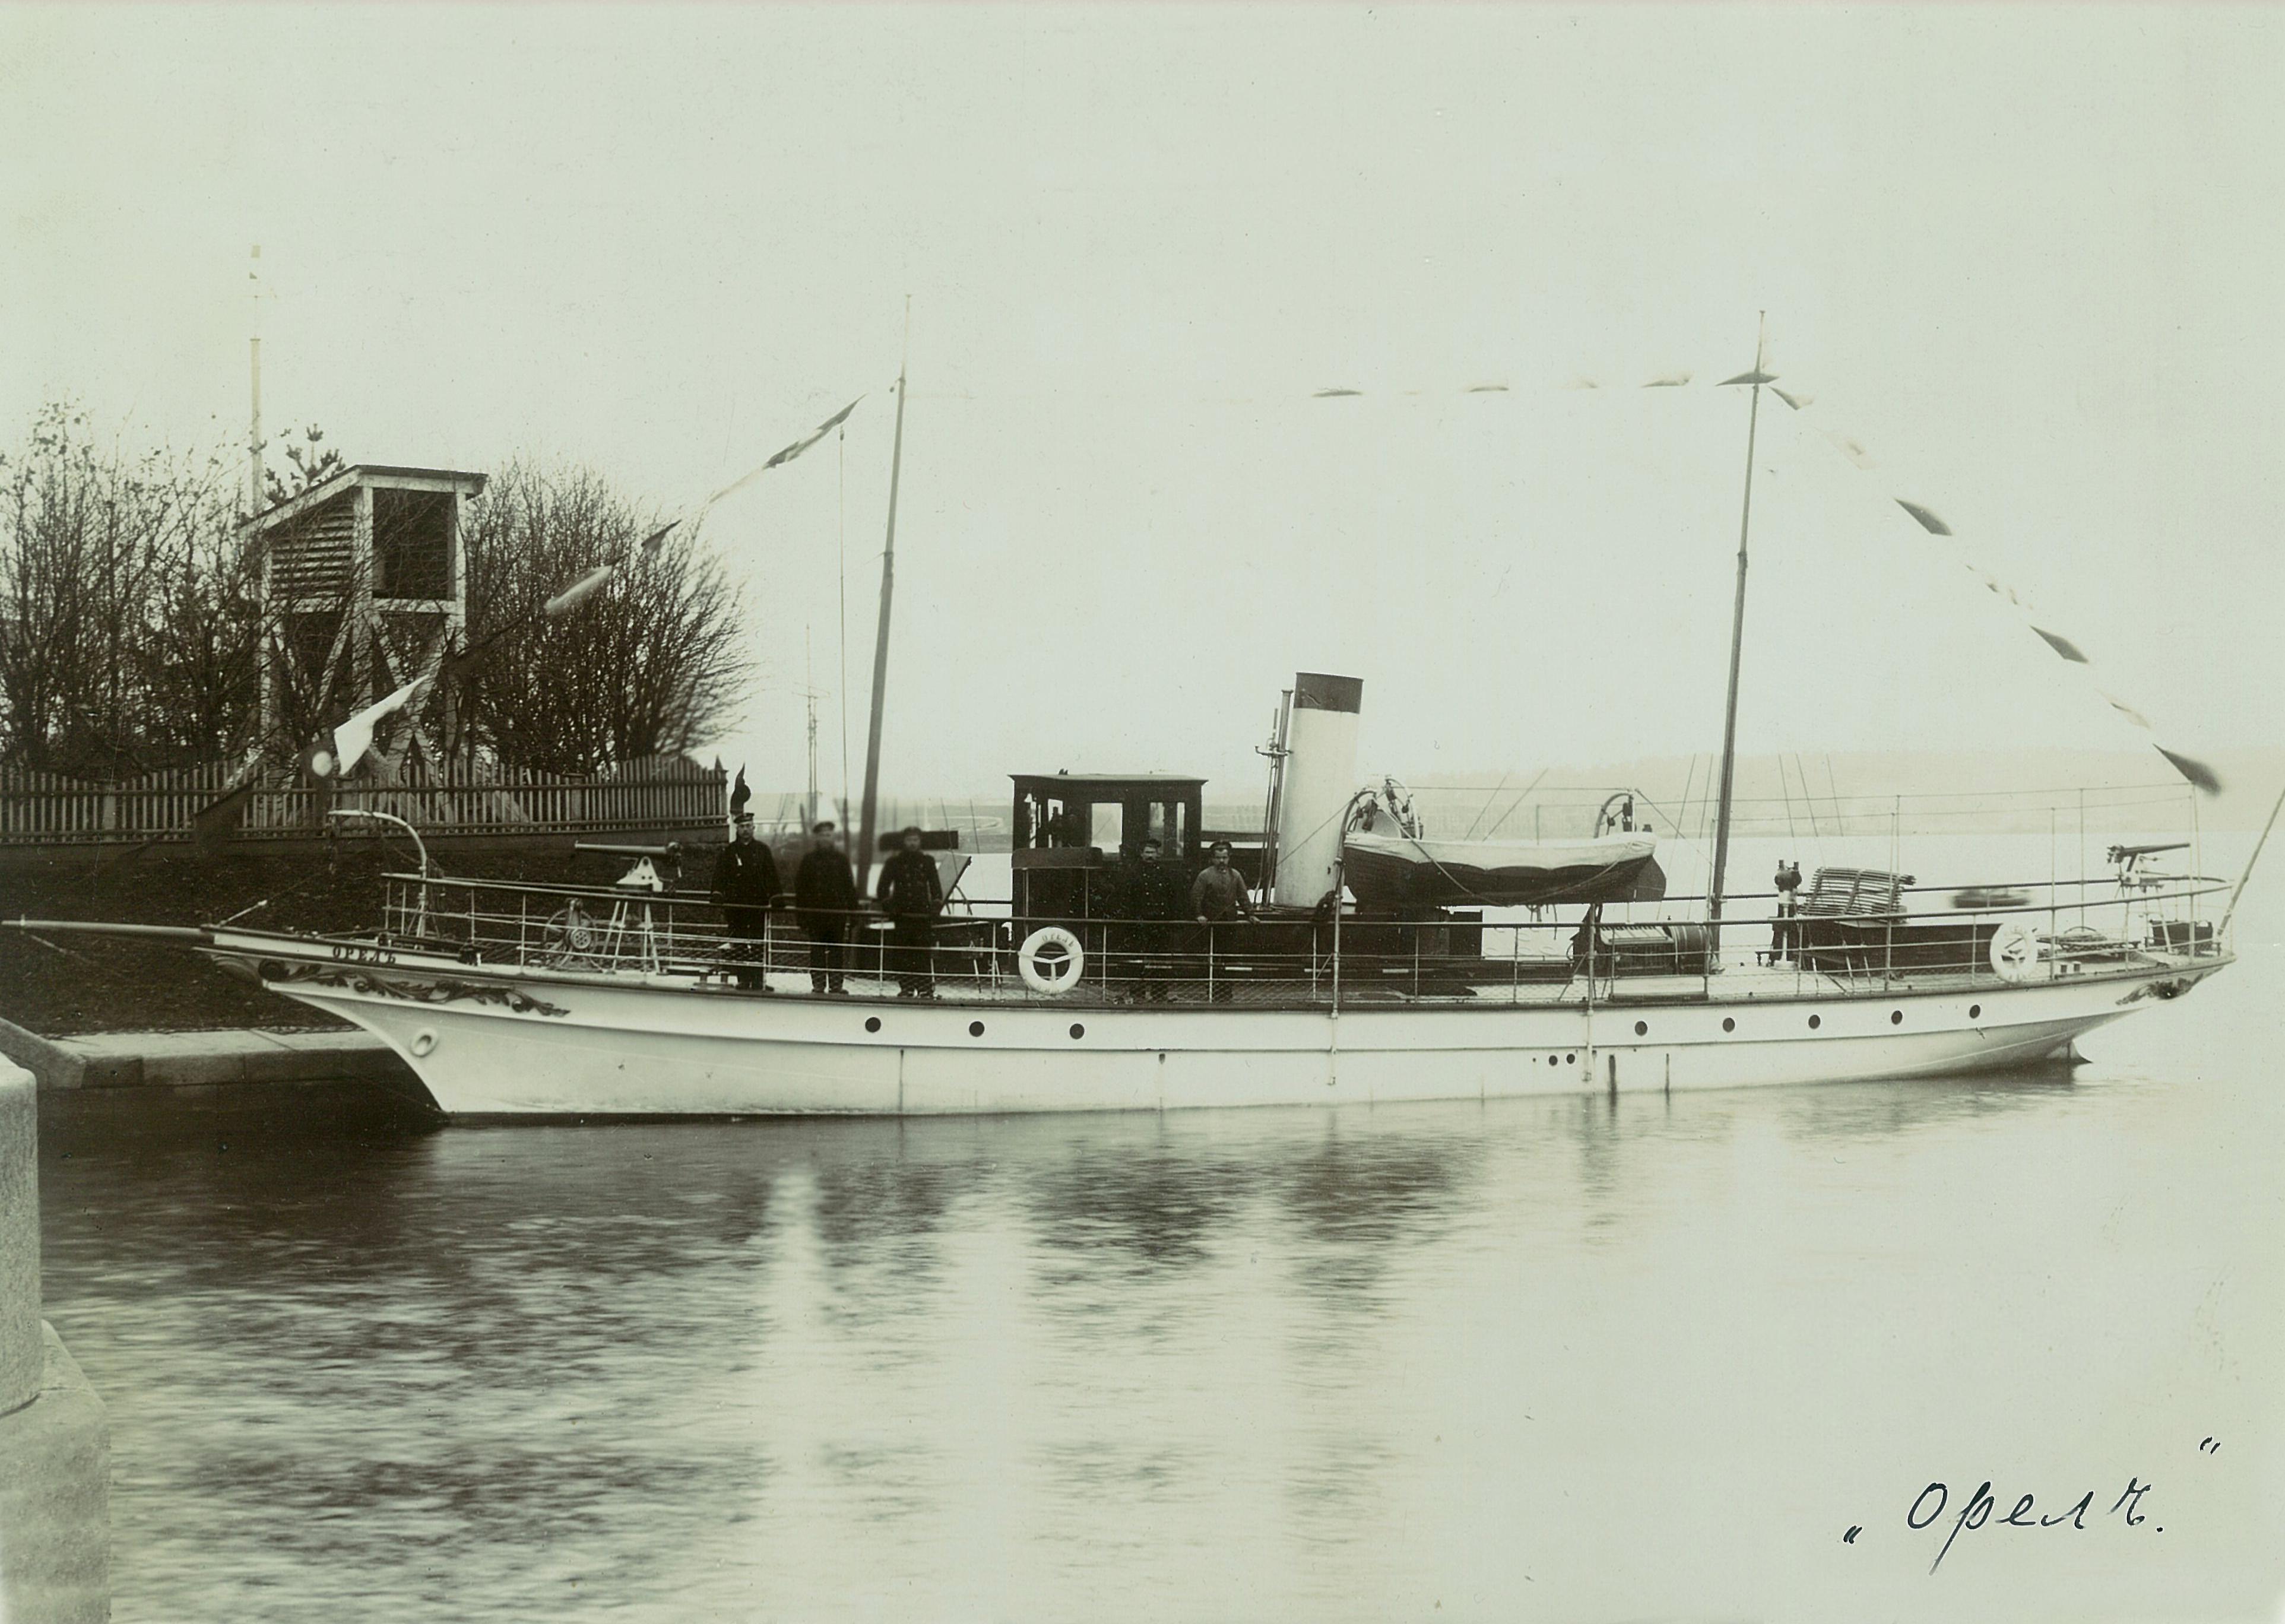 Яхта В.П.Всеволожского «Орёл» у пристани с командой